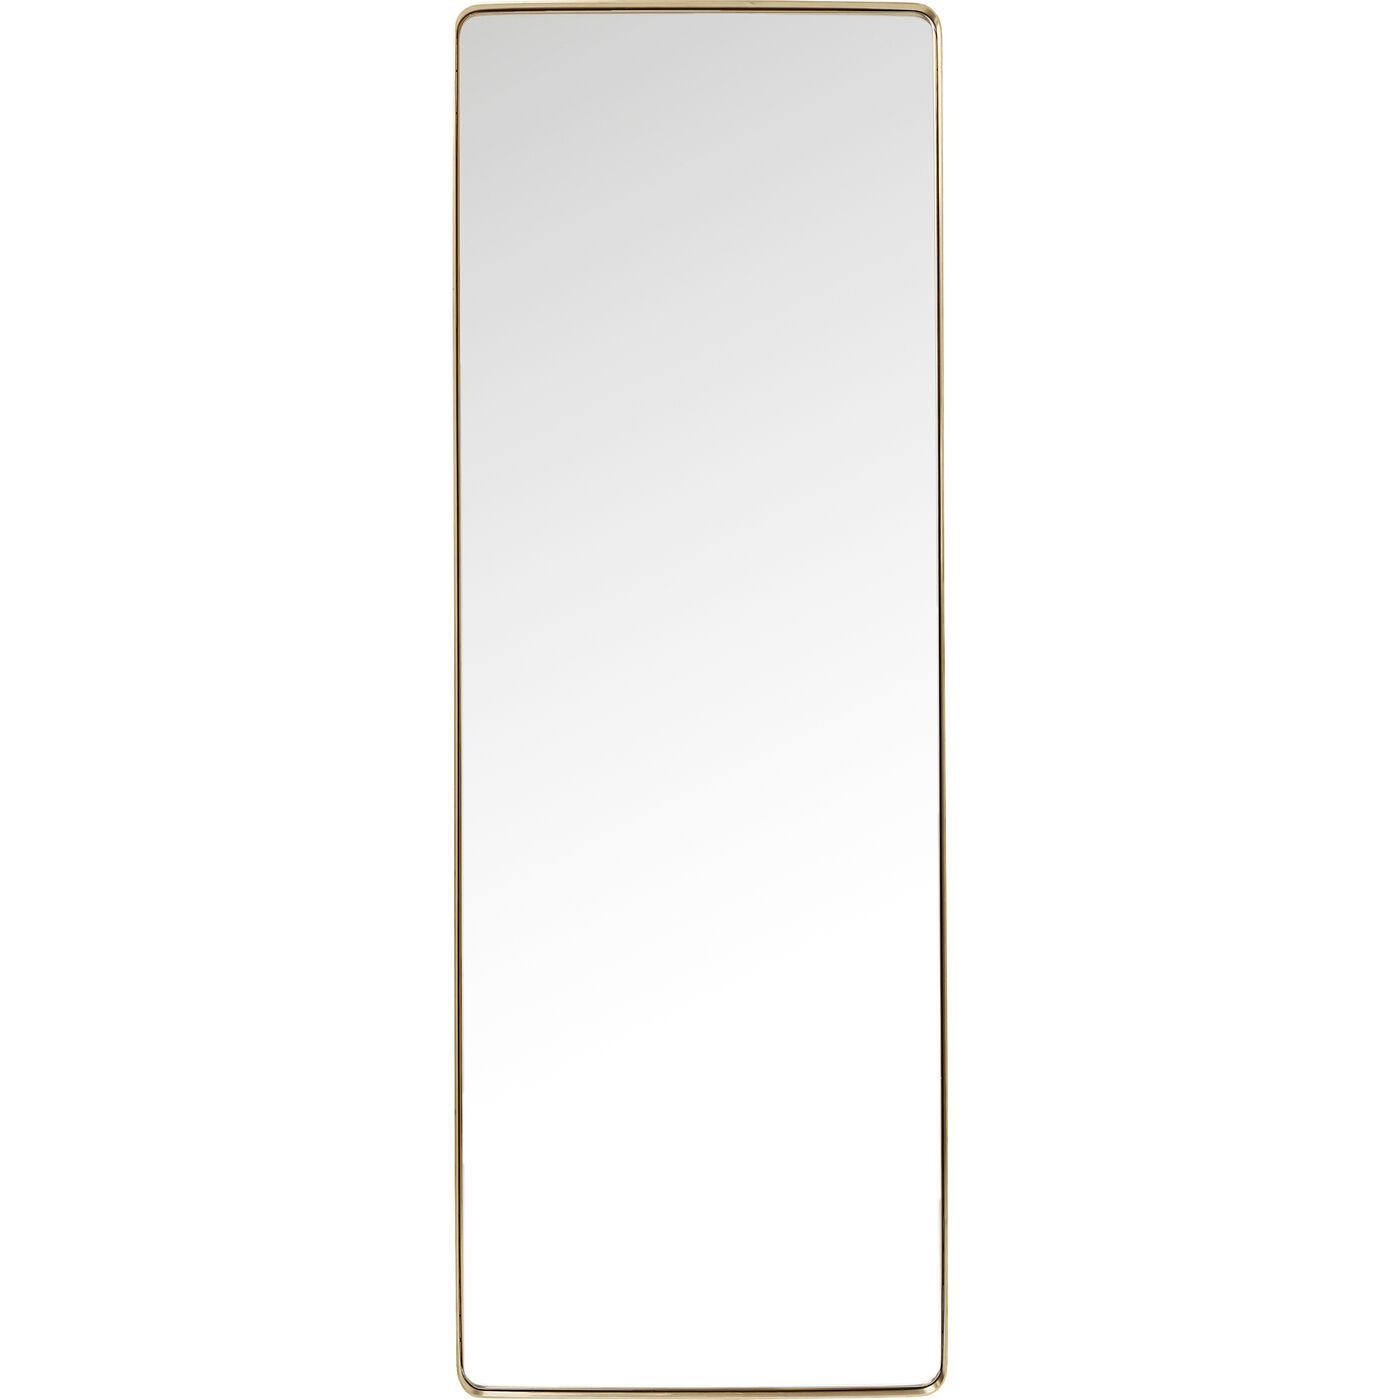 Spiegel Curve MO Rectangular Brass 200x70cm